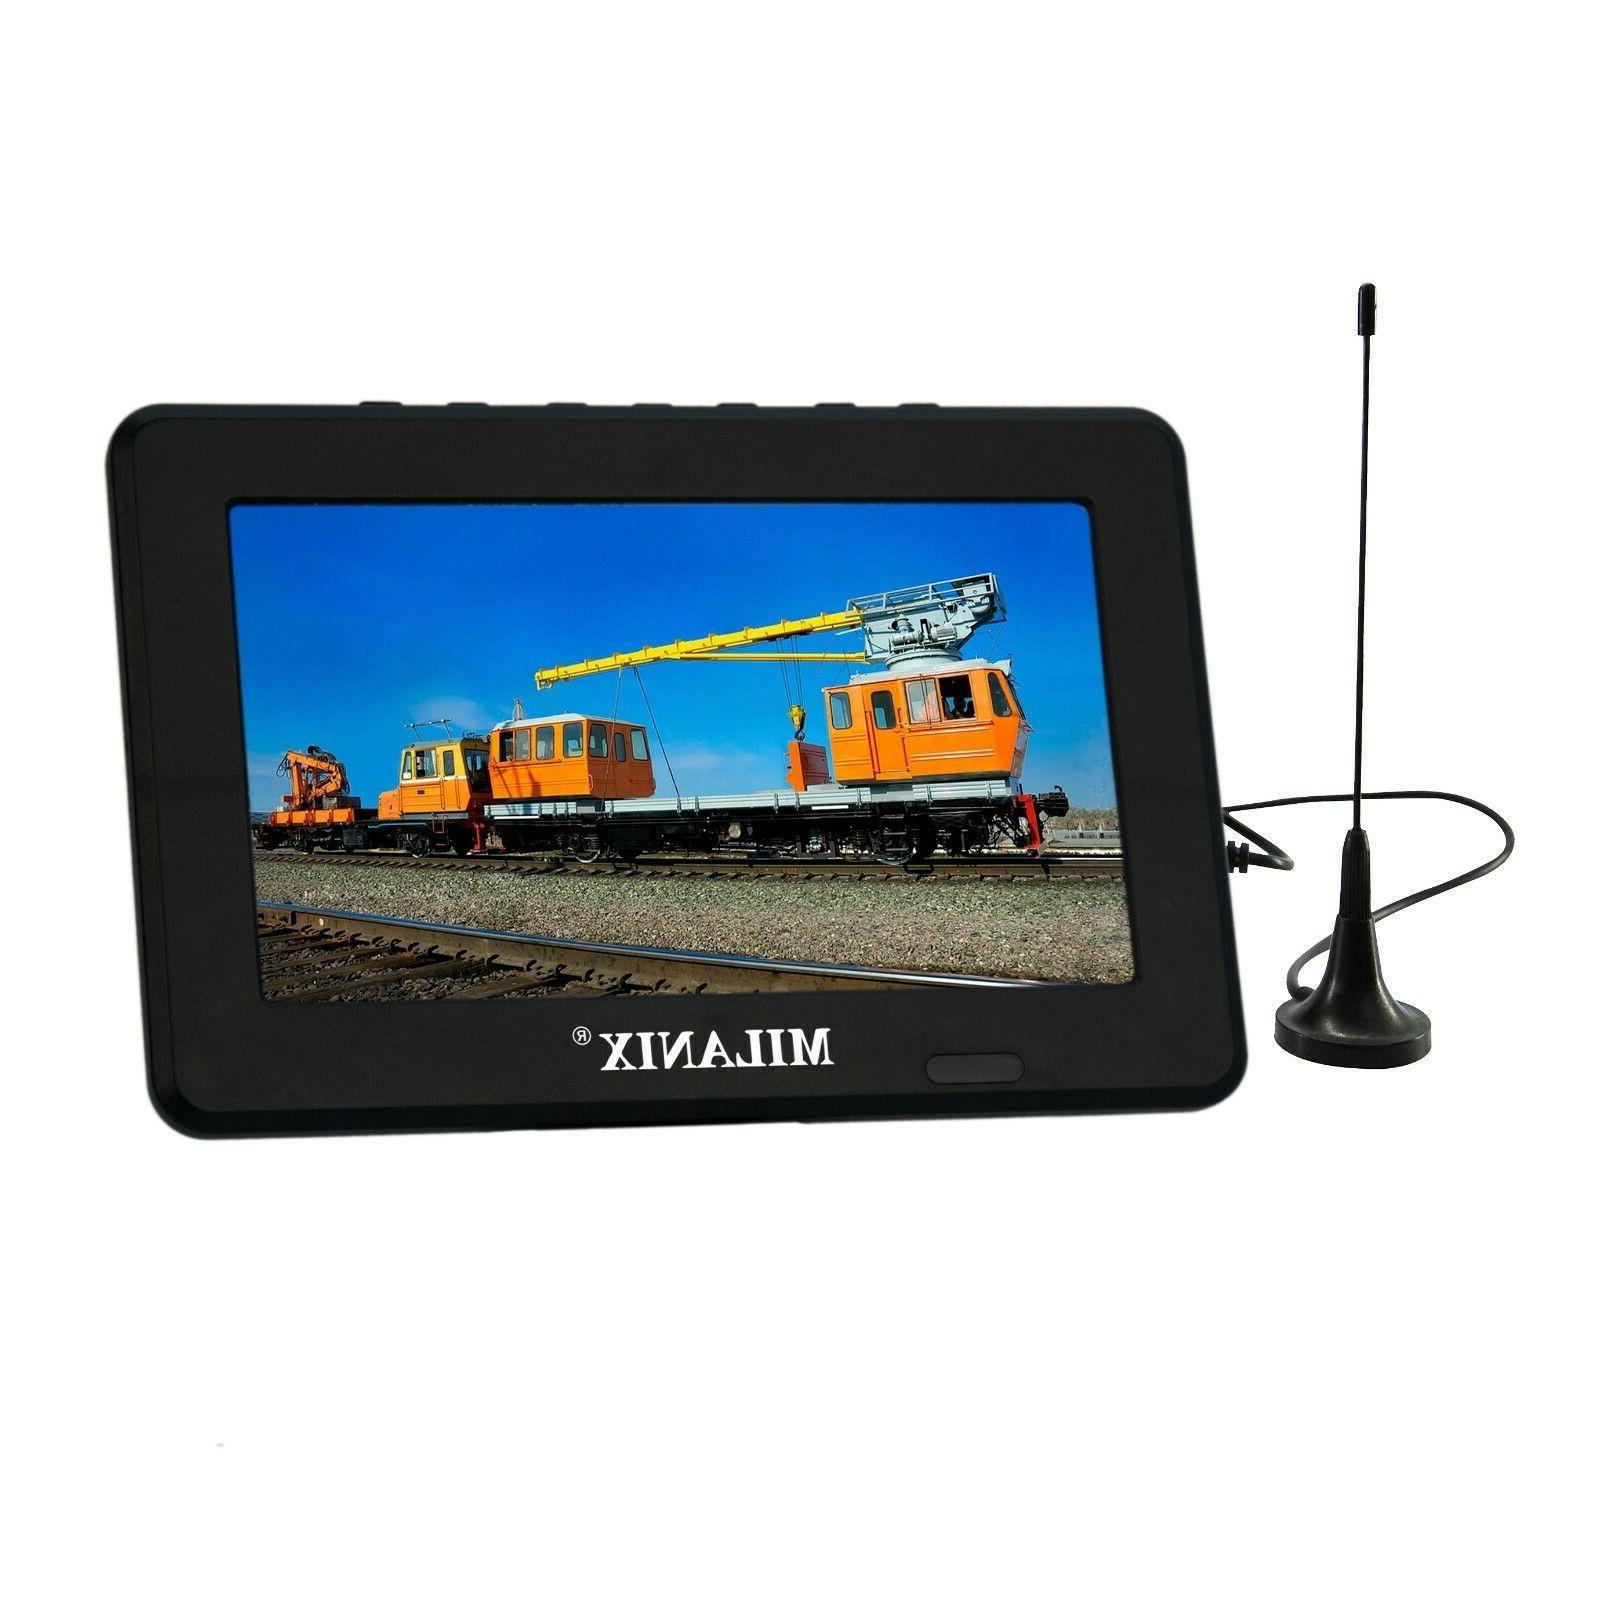 Milanix LCD TV TV Tuner & SD In